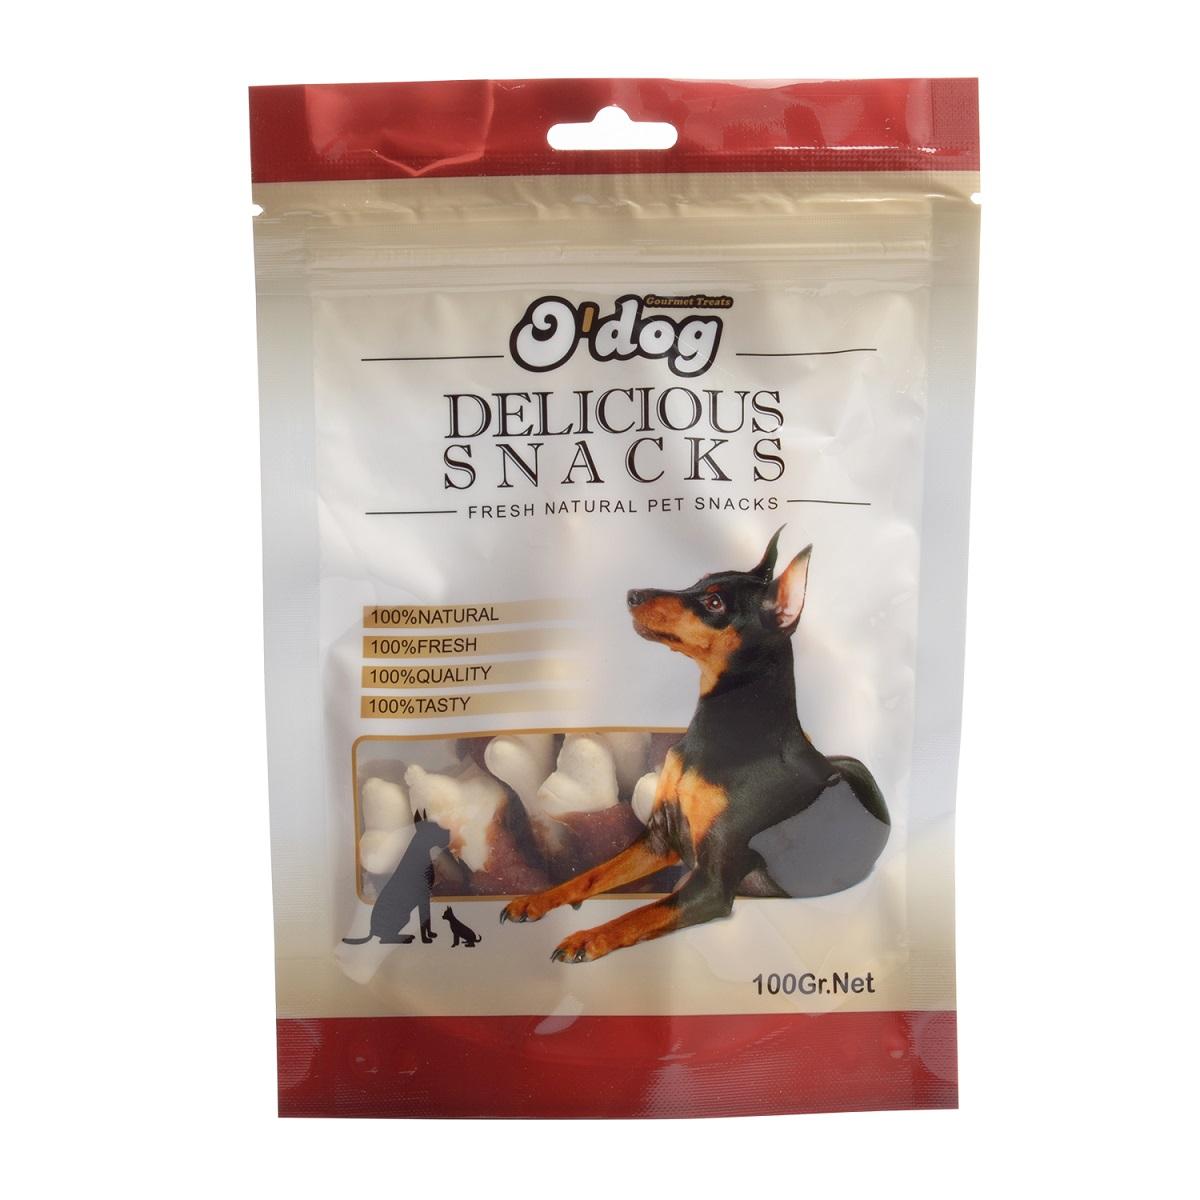 غذای تشویقی سگ اُداگ مدل Beef mince & starch bone وزن ۱۰۰ گرم